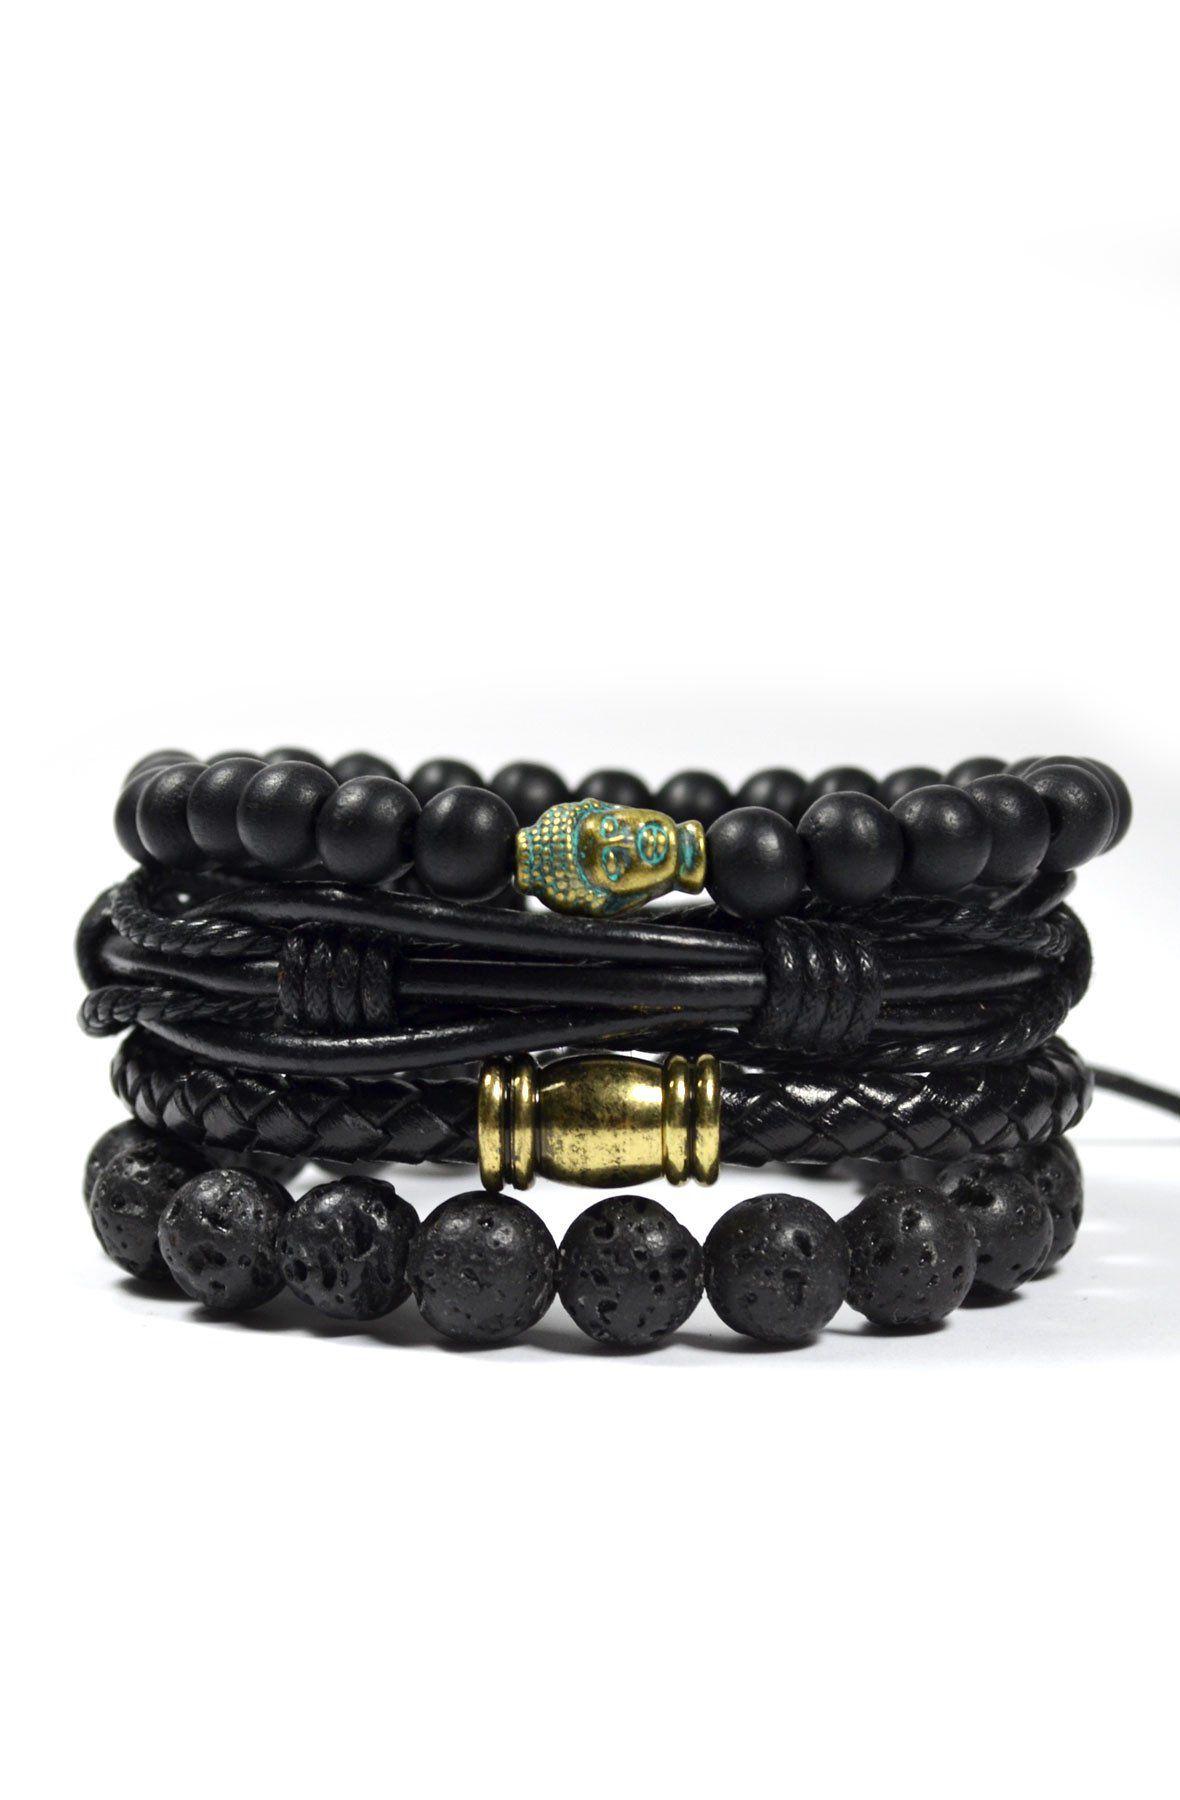 Image of 4 Pack Men's Bracelet Set / Raider